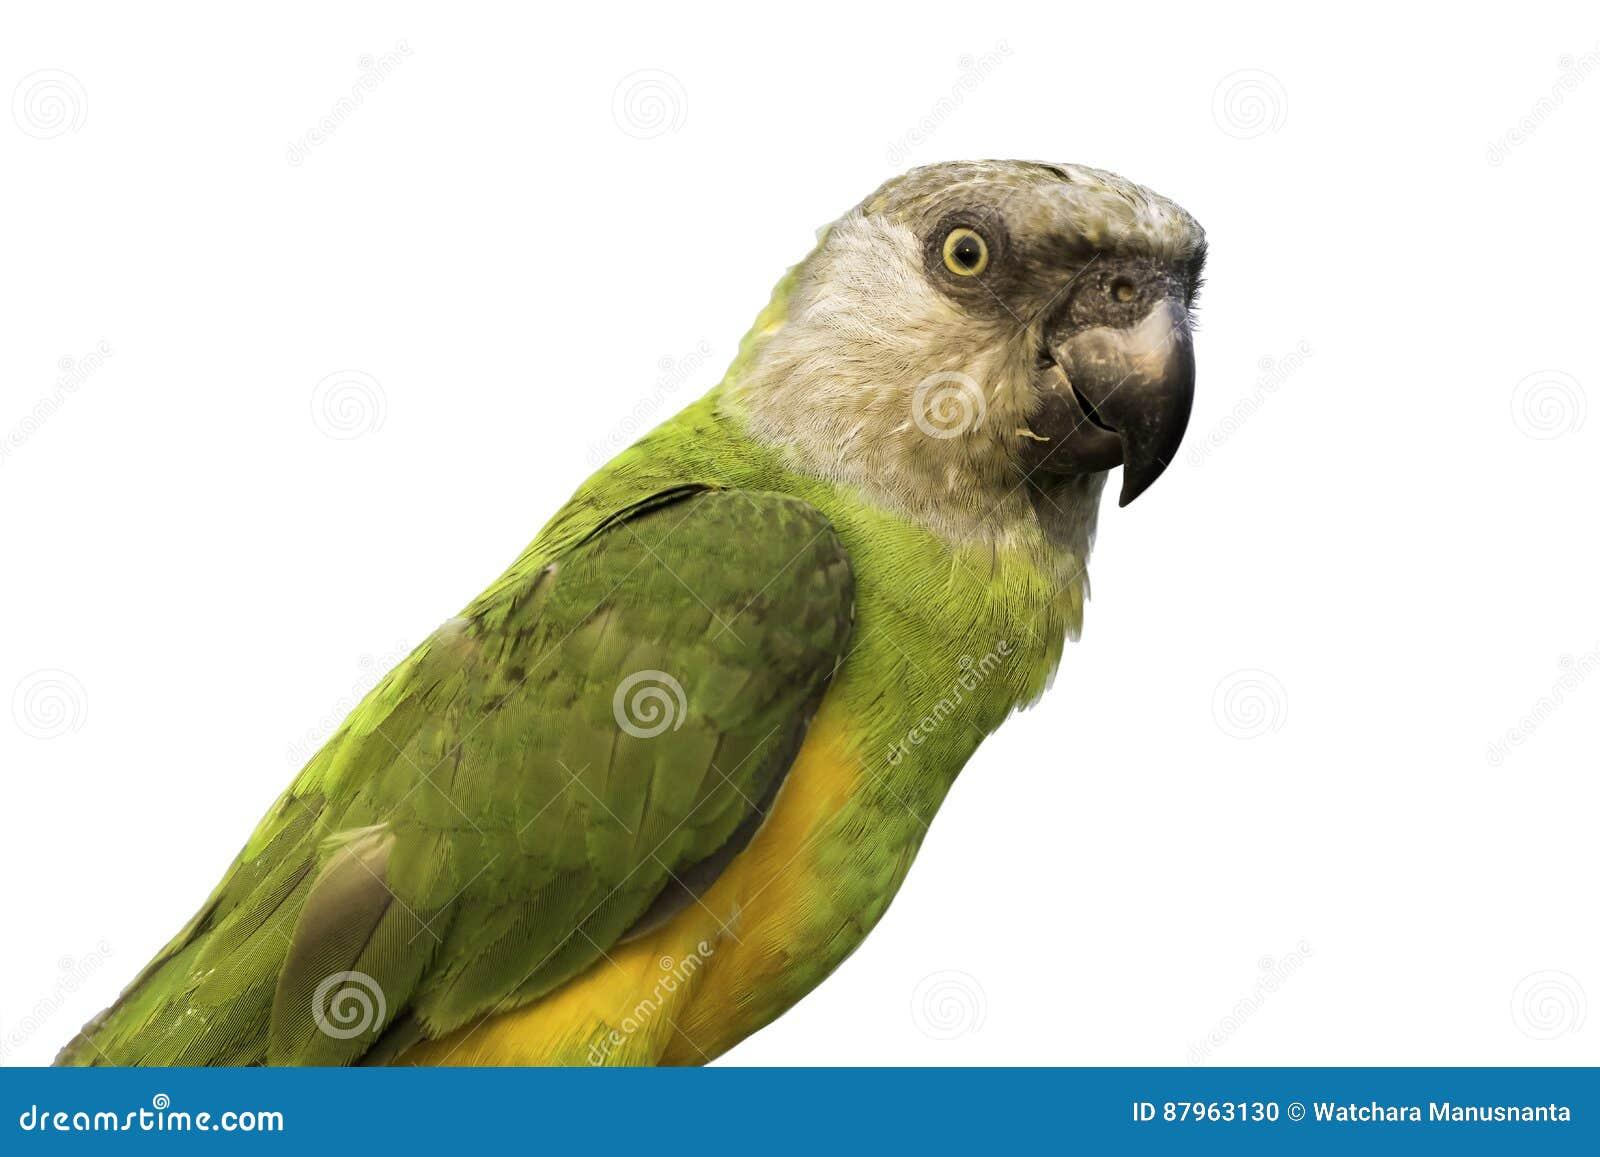 Retrato do papagaio de Senegal no fundo branco, trajeto de grampeamento